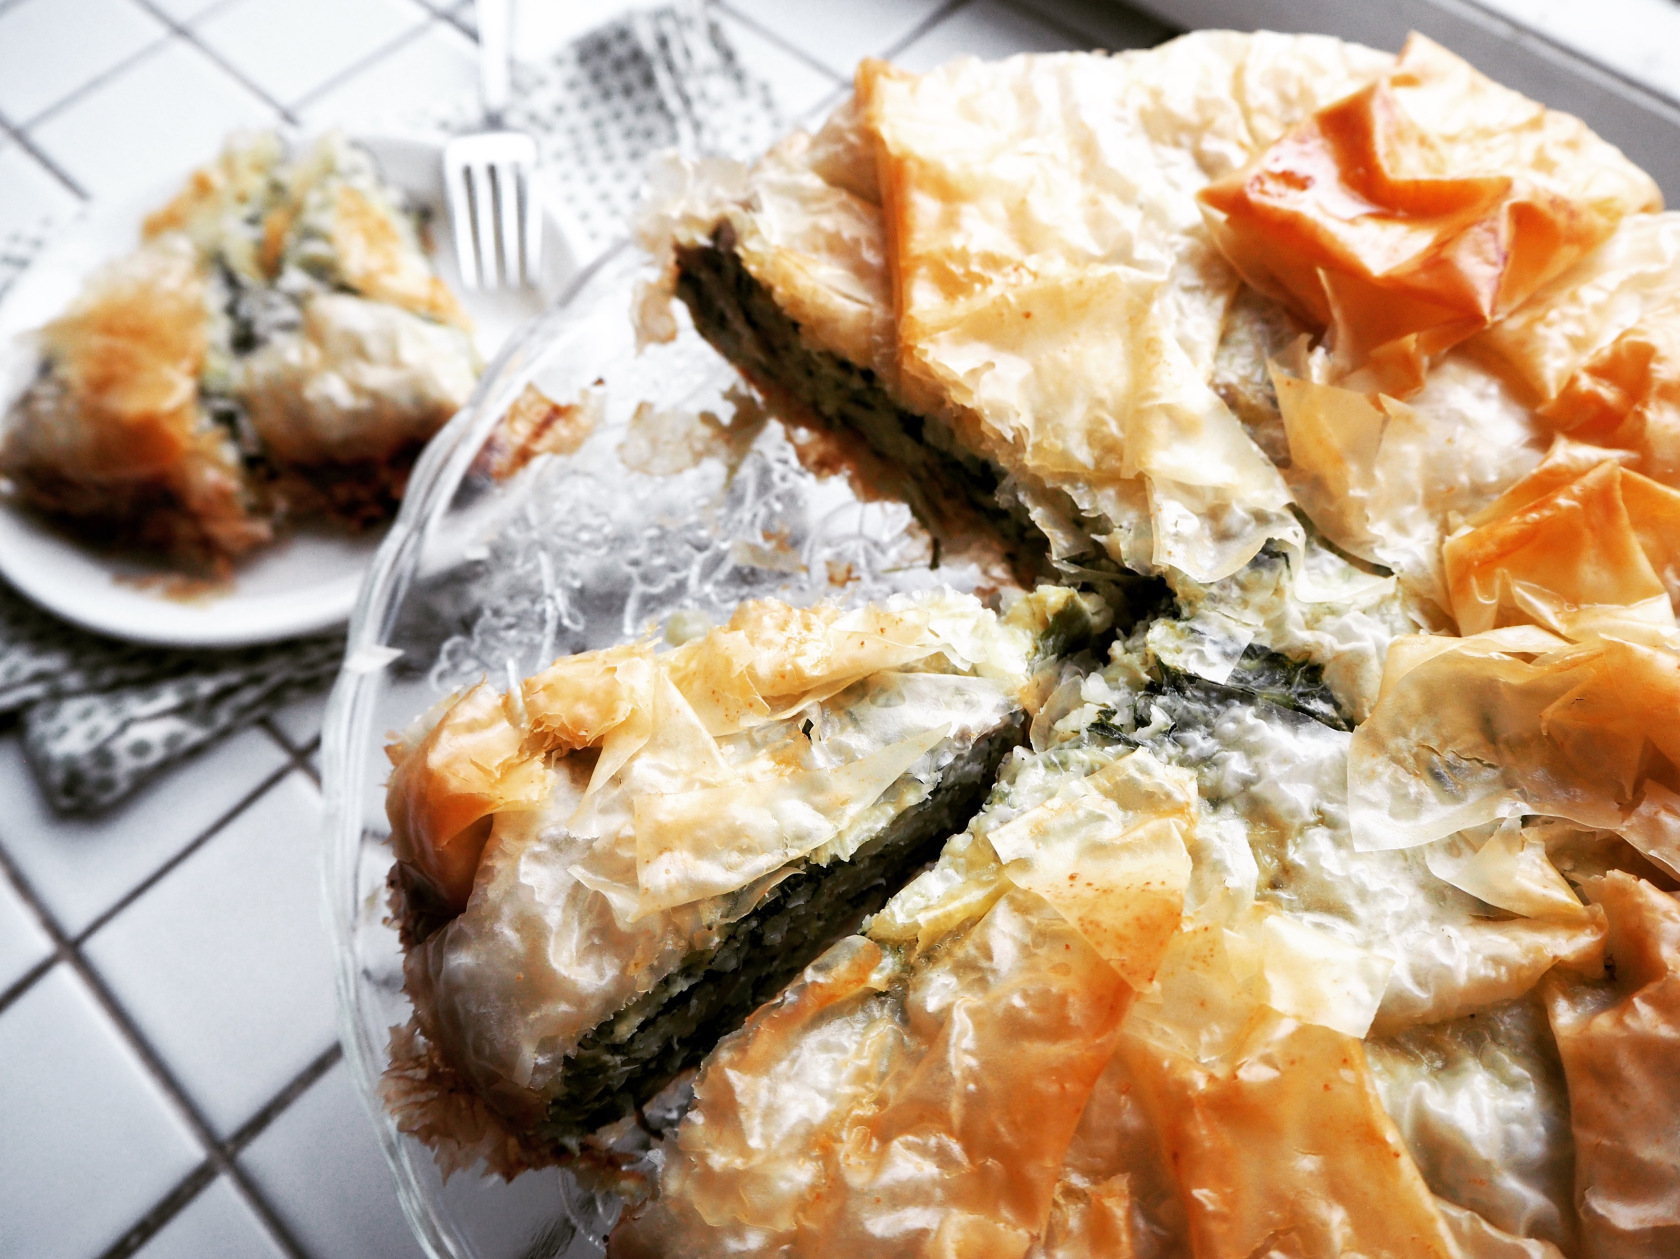 Phyllo Pie With Fennel, Mushroom, Rice, and Leeks